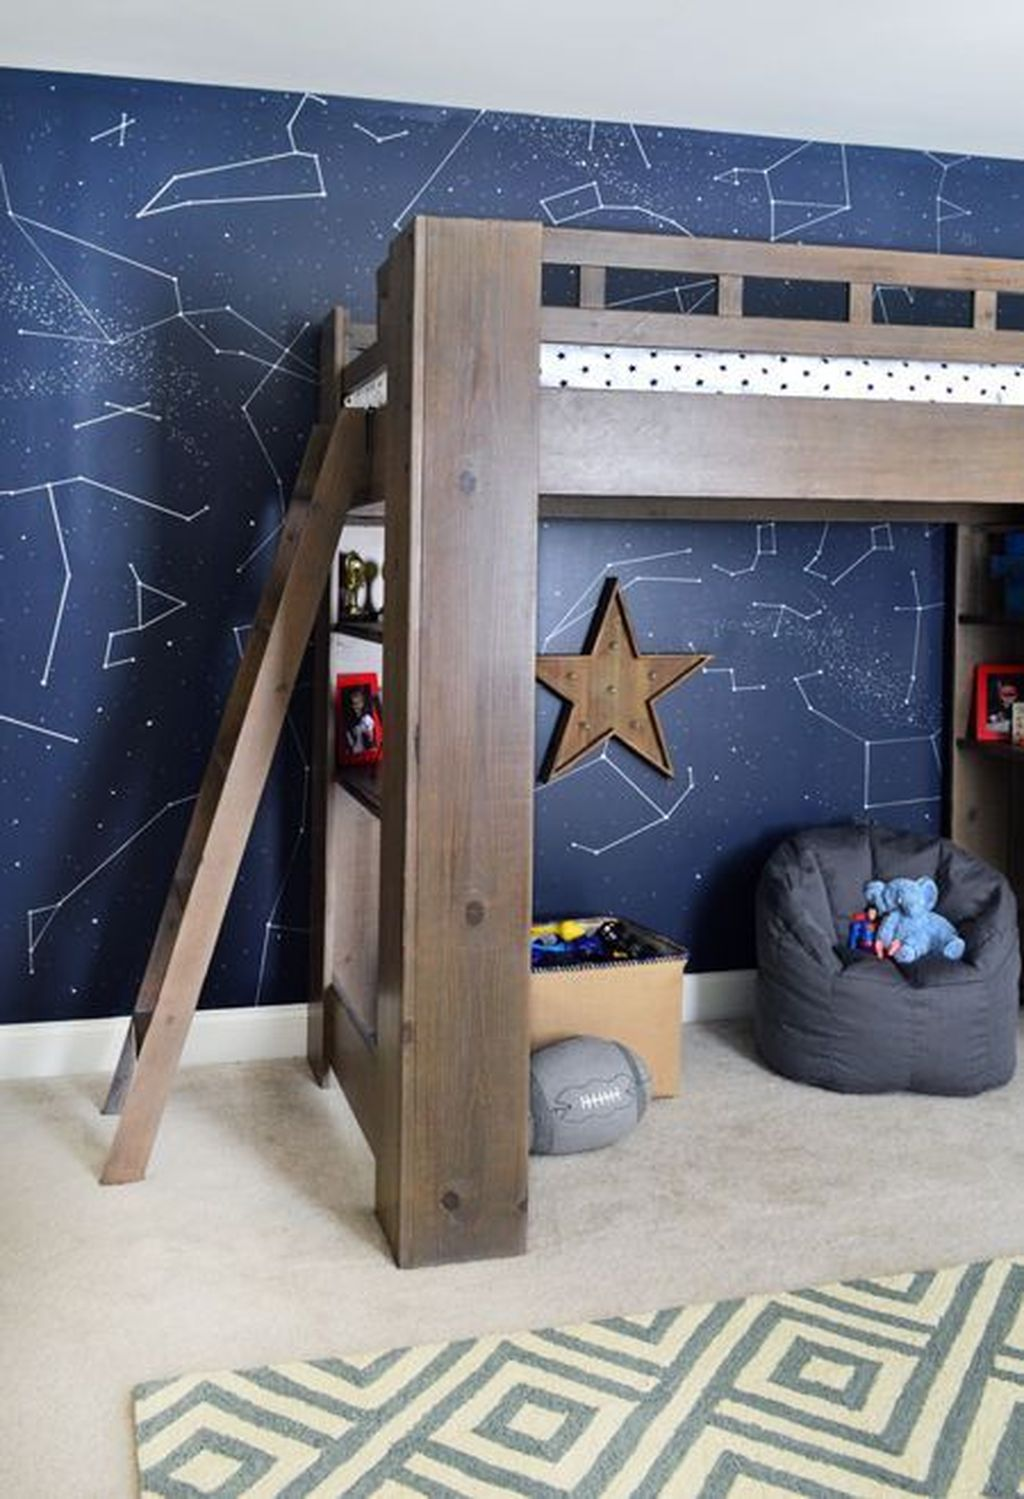 Inspiring Outer Space Bedroom Decor Ideas 10